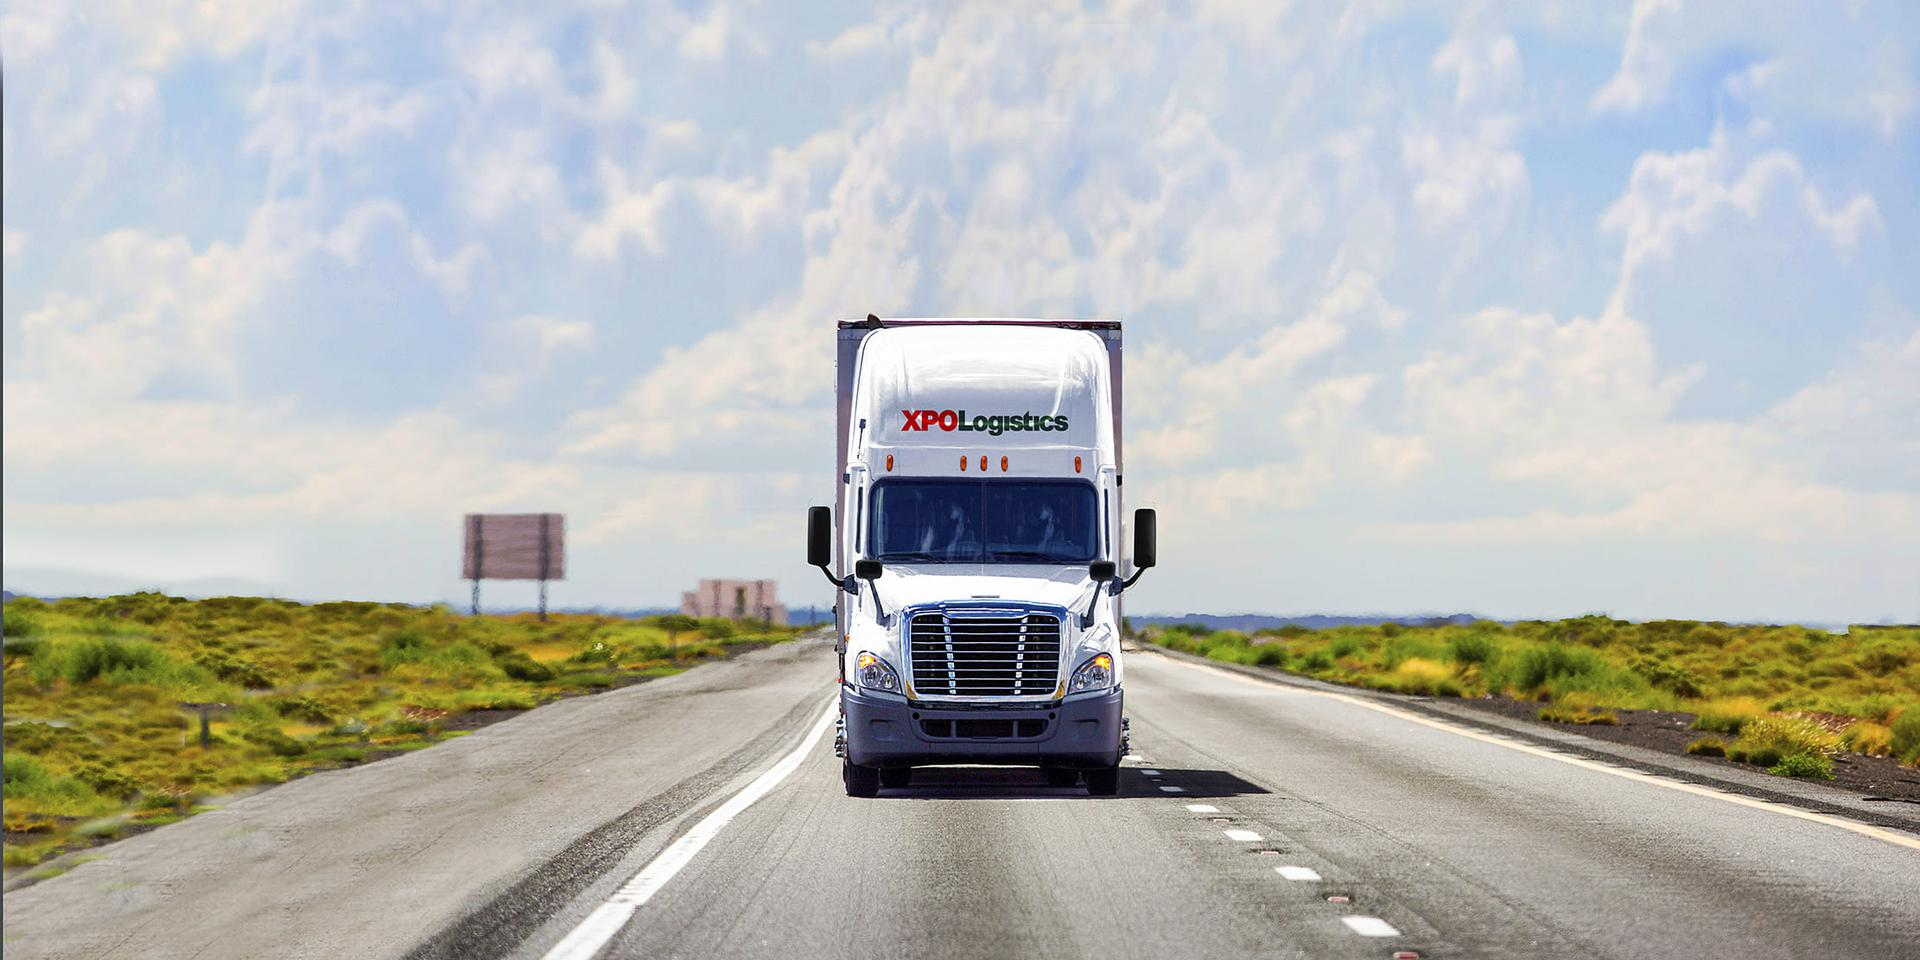 XPO full truckload